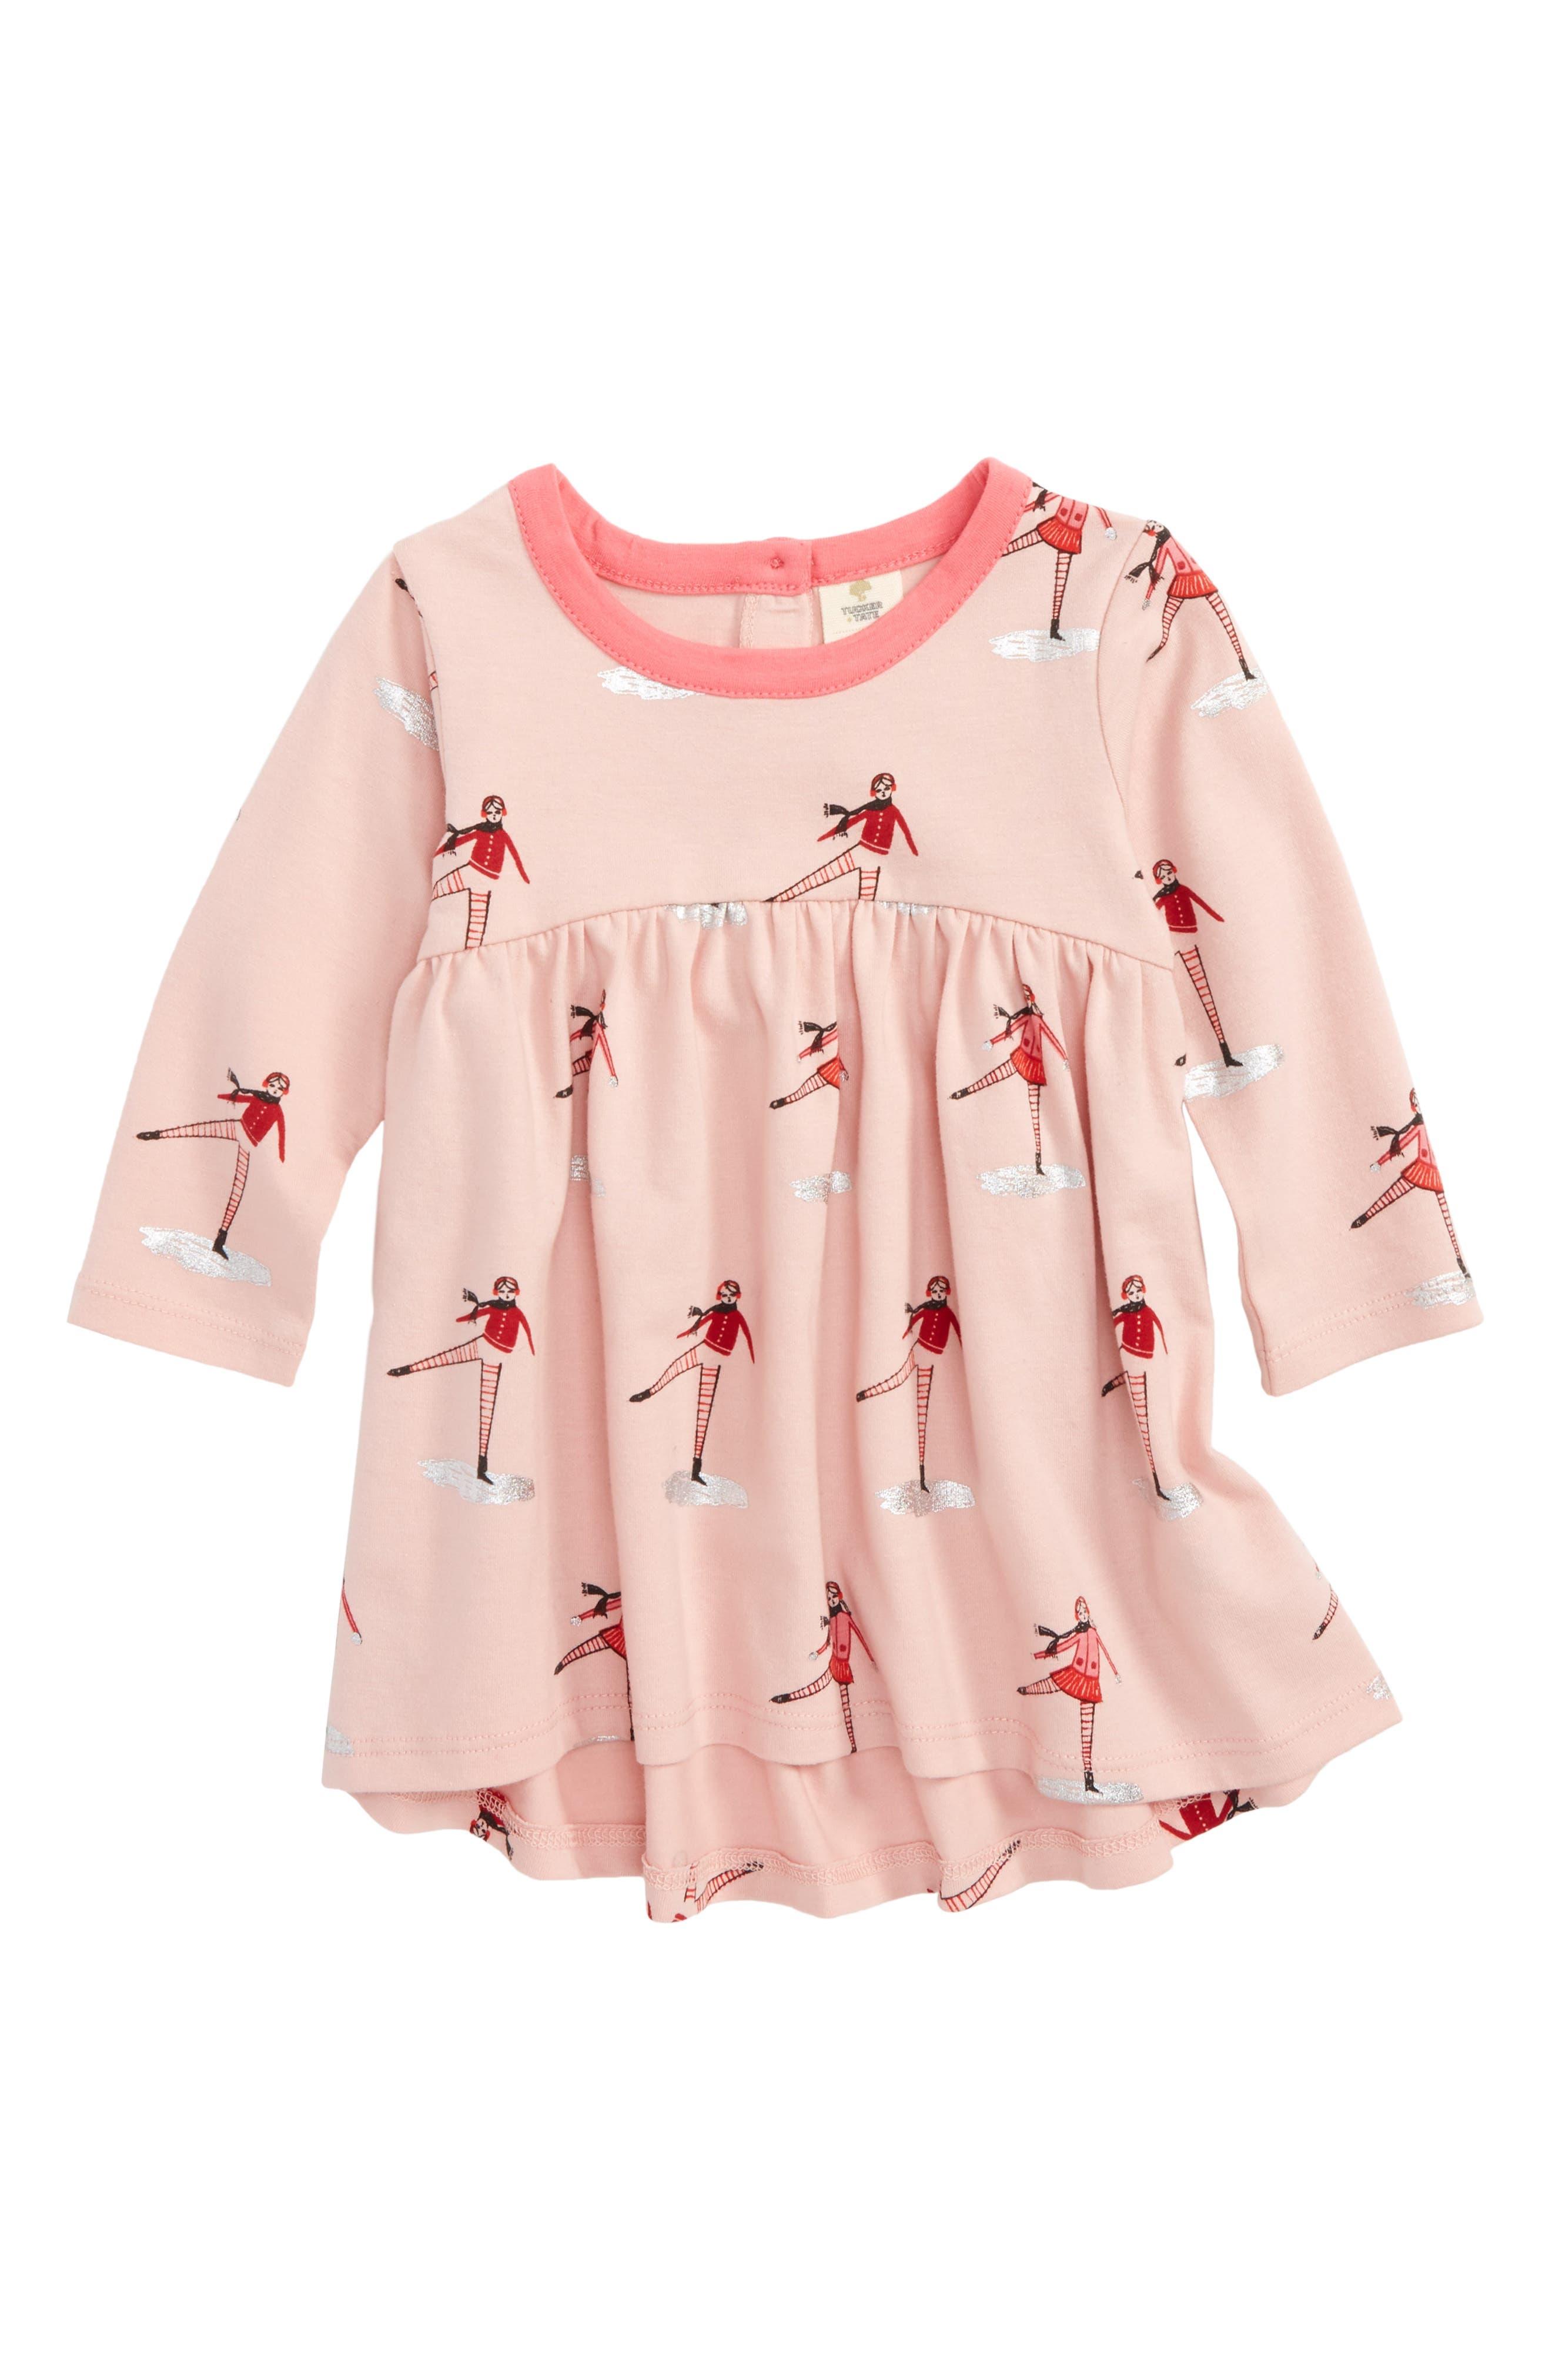 Alternate Image 1 Selected - Tucker + Tate High/Low Dress (Baby Girls)